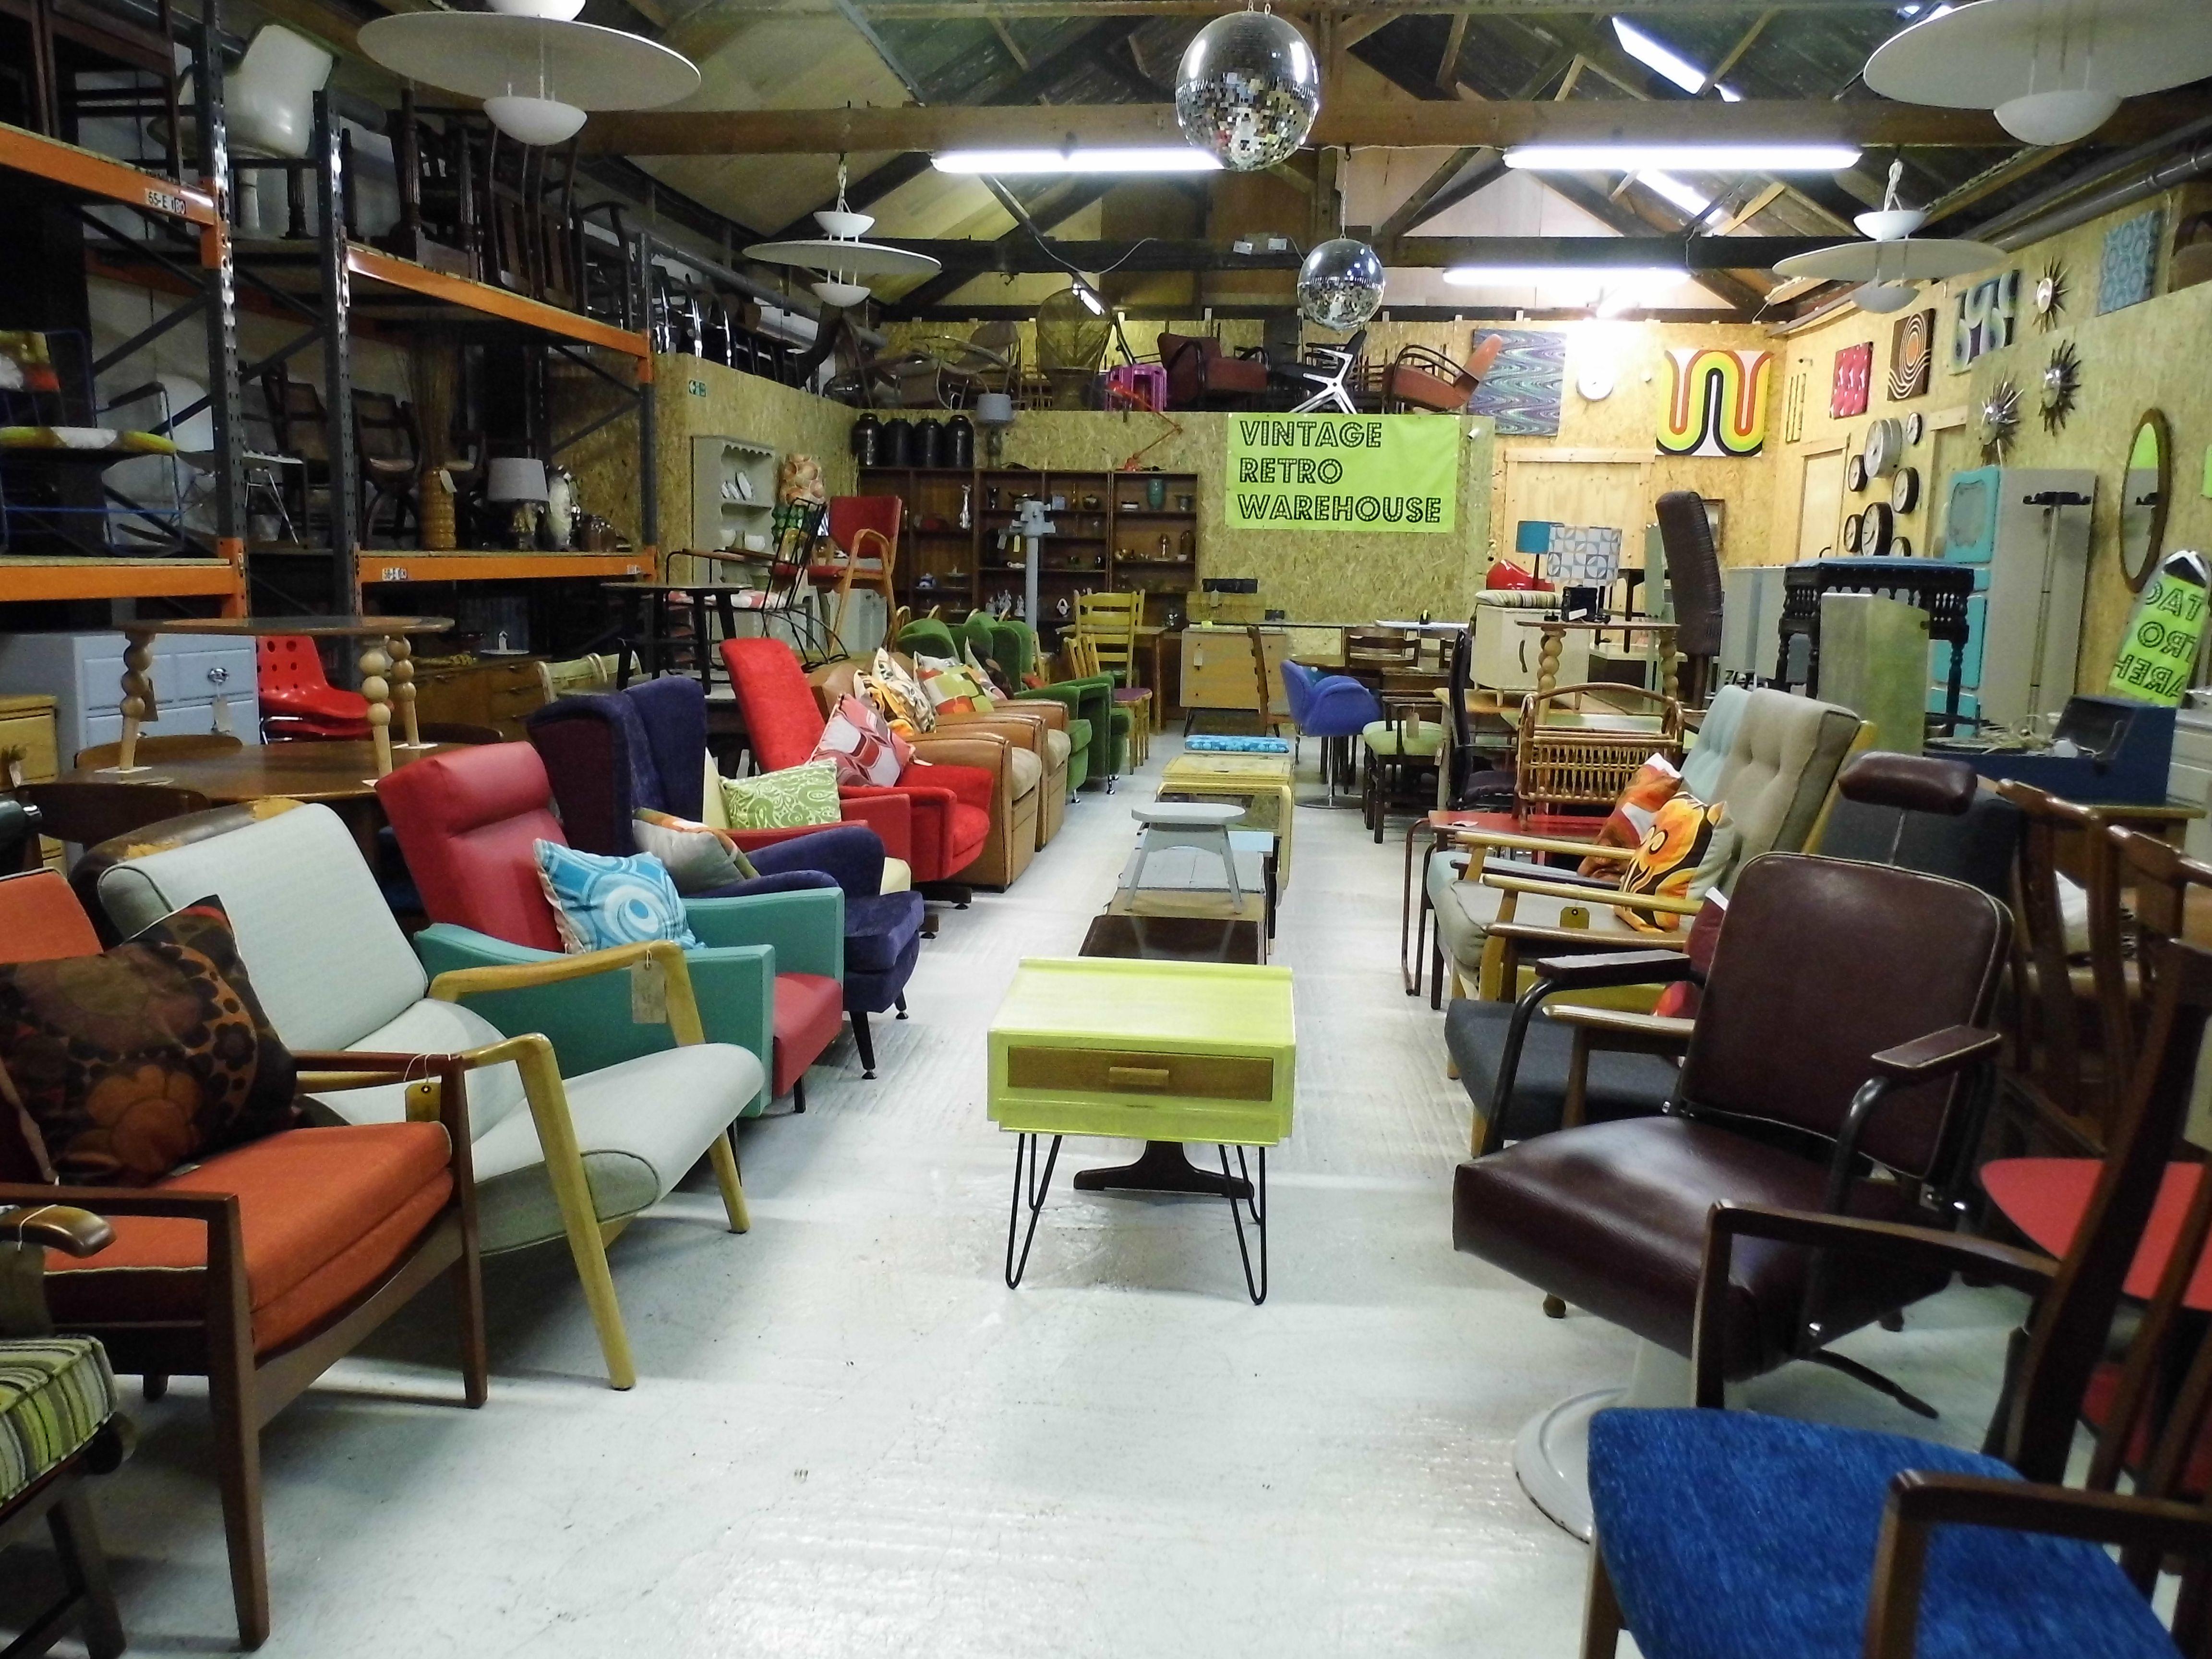 I Furniture Warehouse